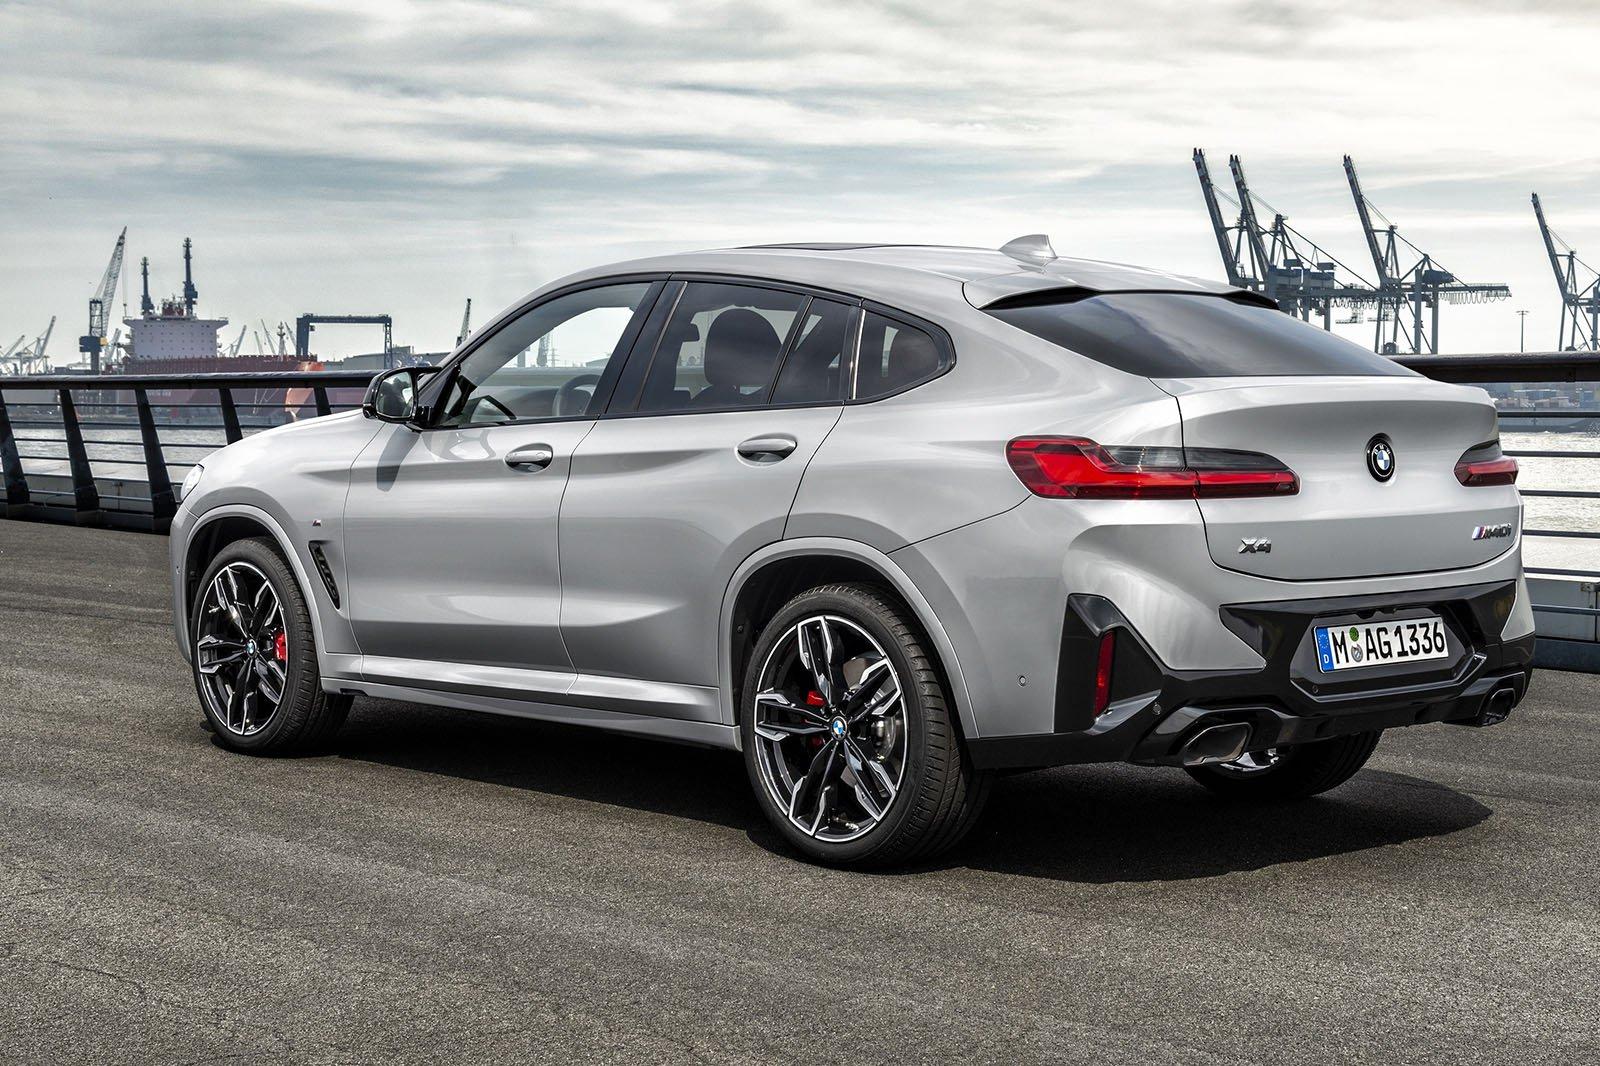 2021 BMW X4 rear exterior